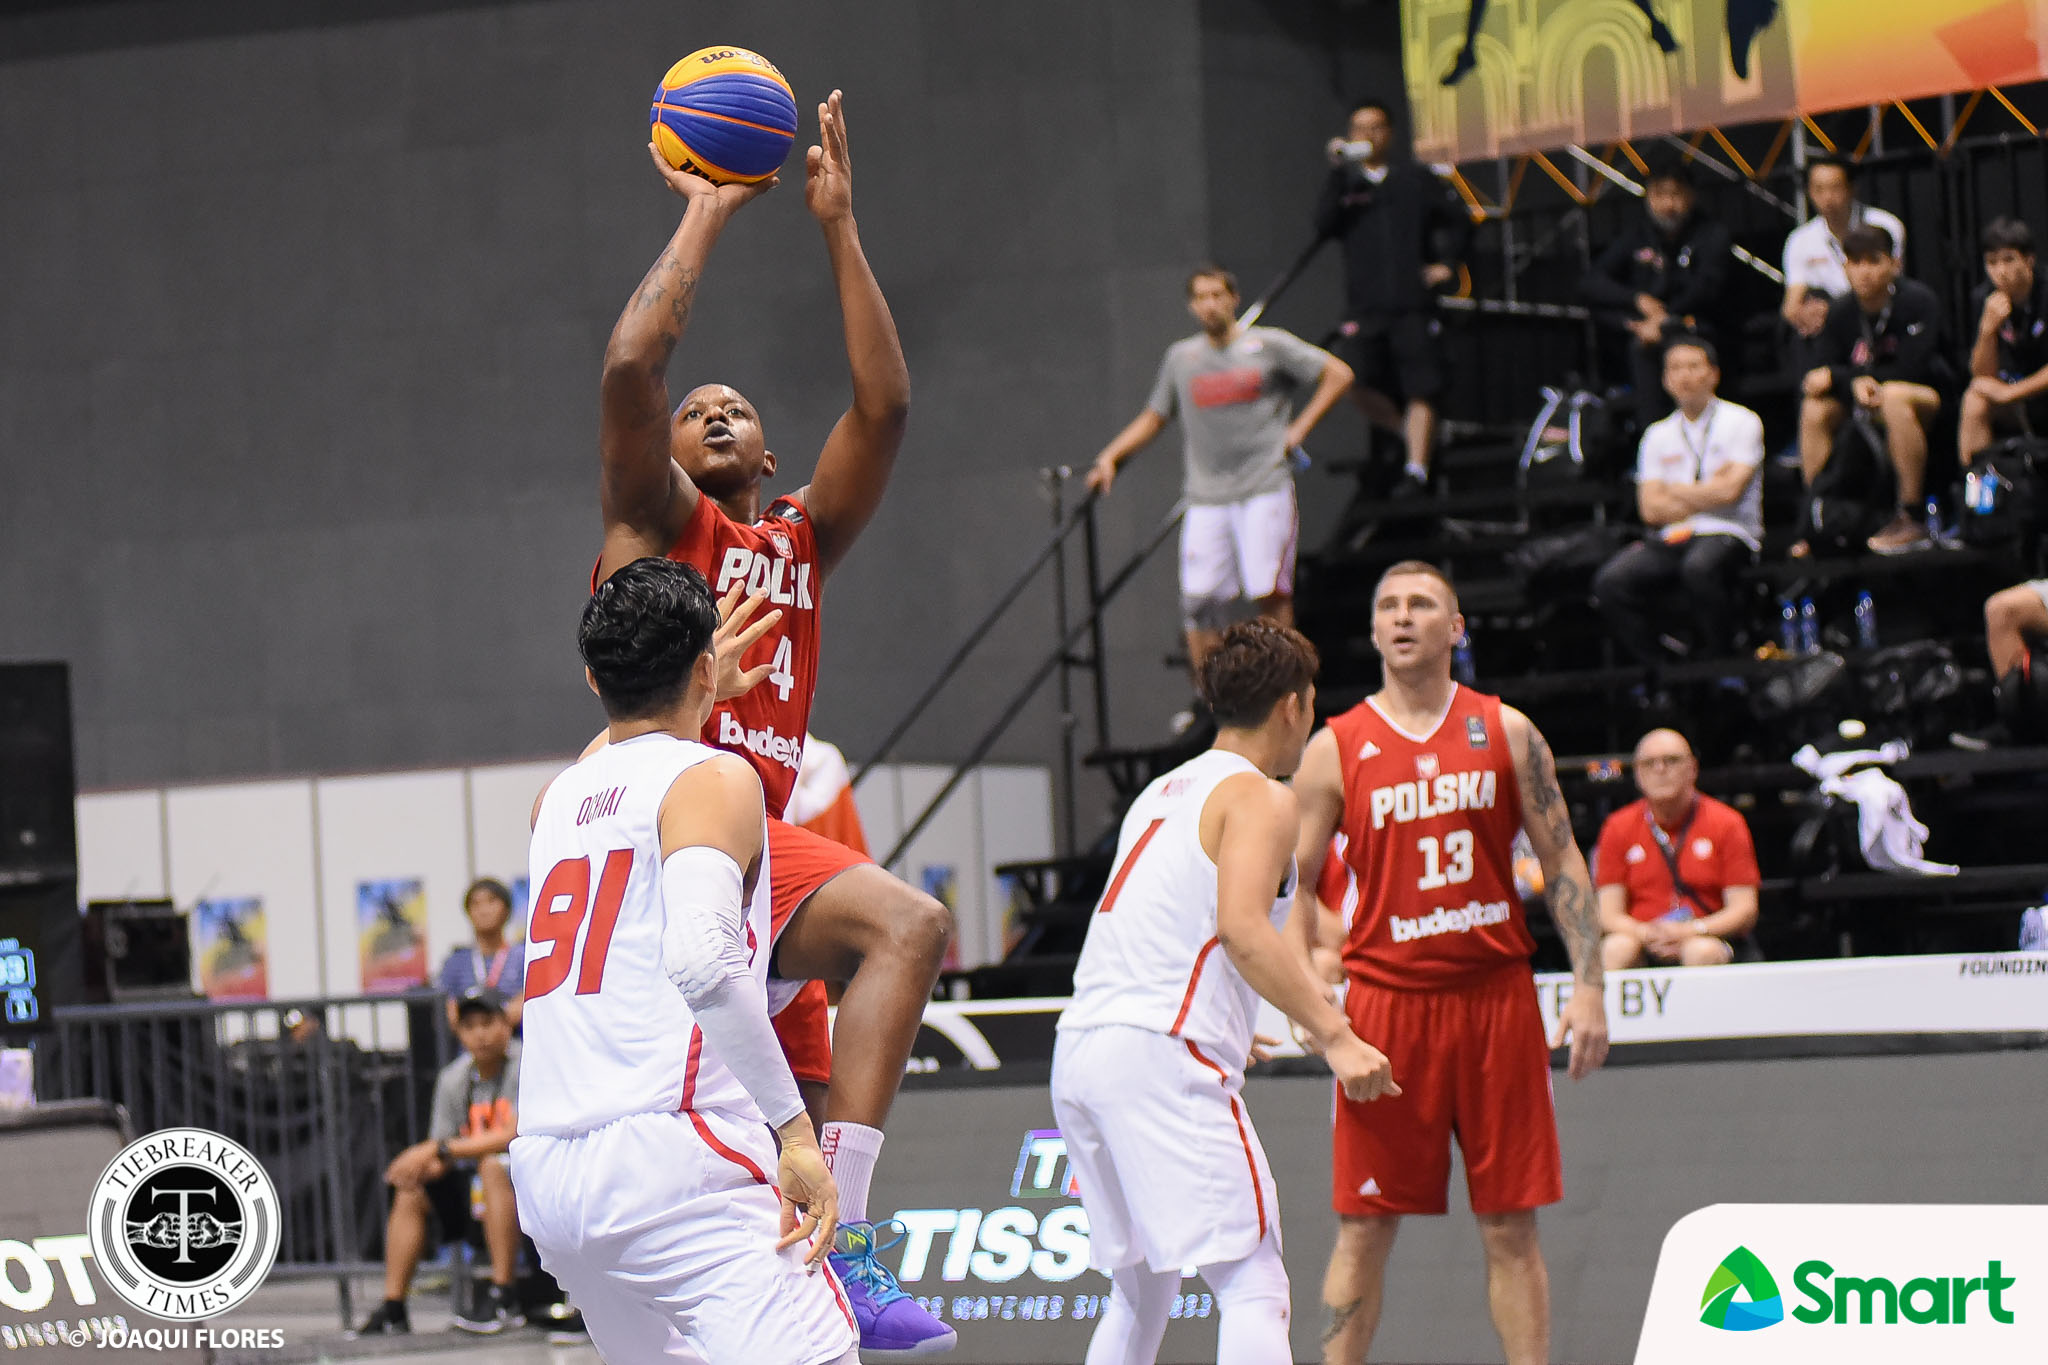 FIBA 3X3 Poland vs. Japan – Michael Hicks-9174